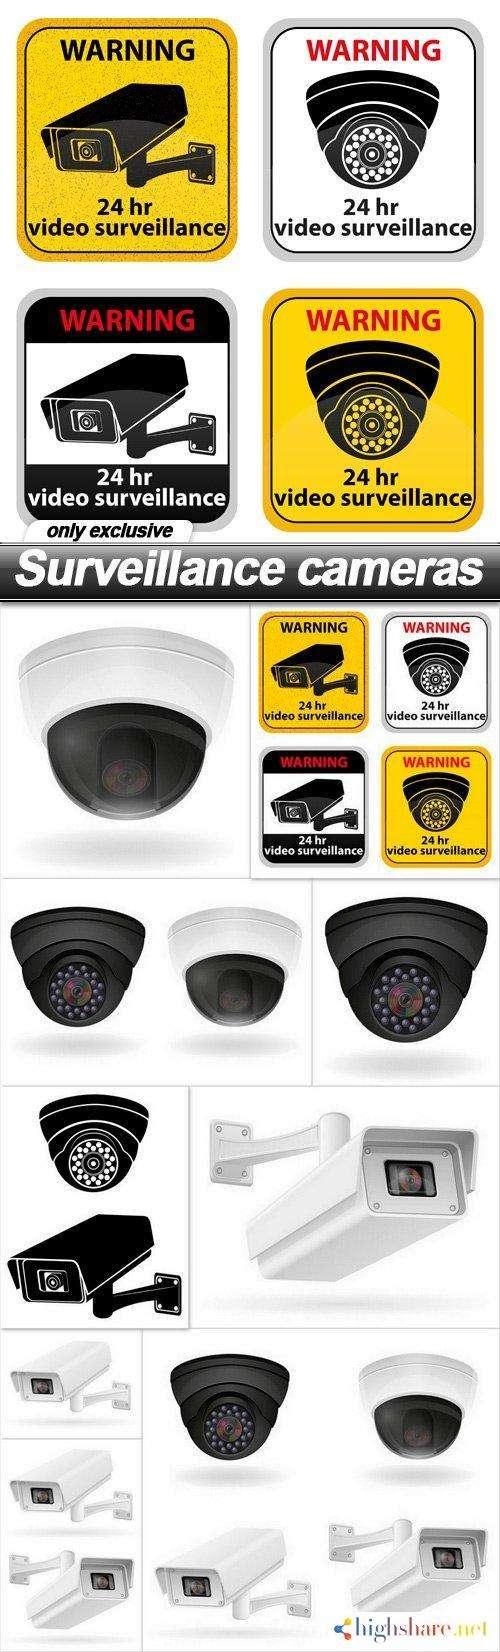 surveillance cameras 9 eps 5f42162f55ca6 - Surveillance cameras - 9 EPS